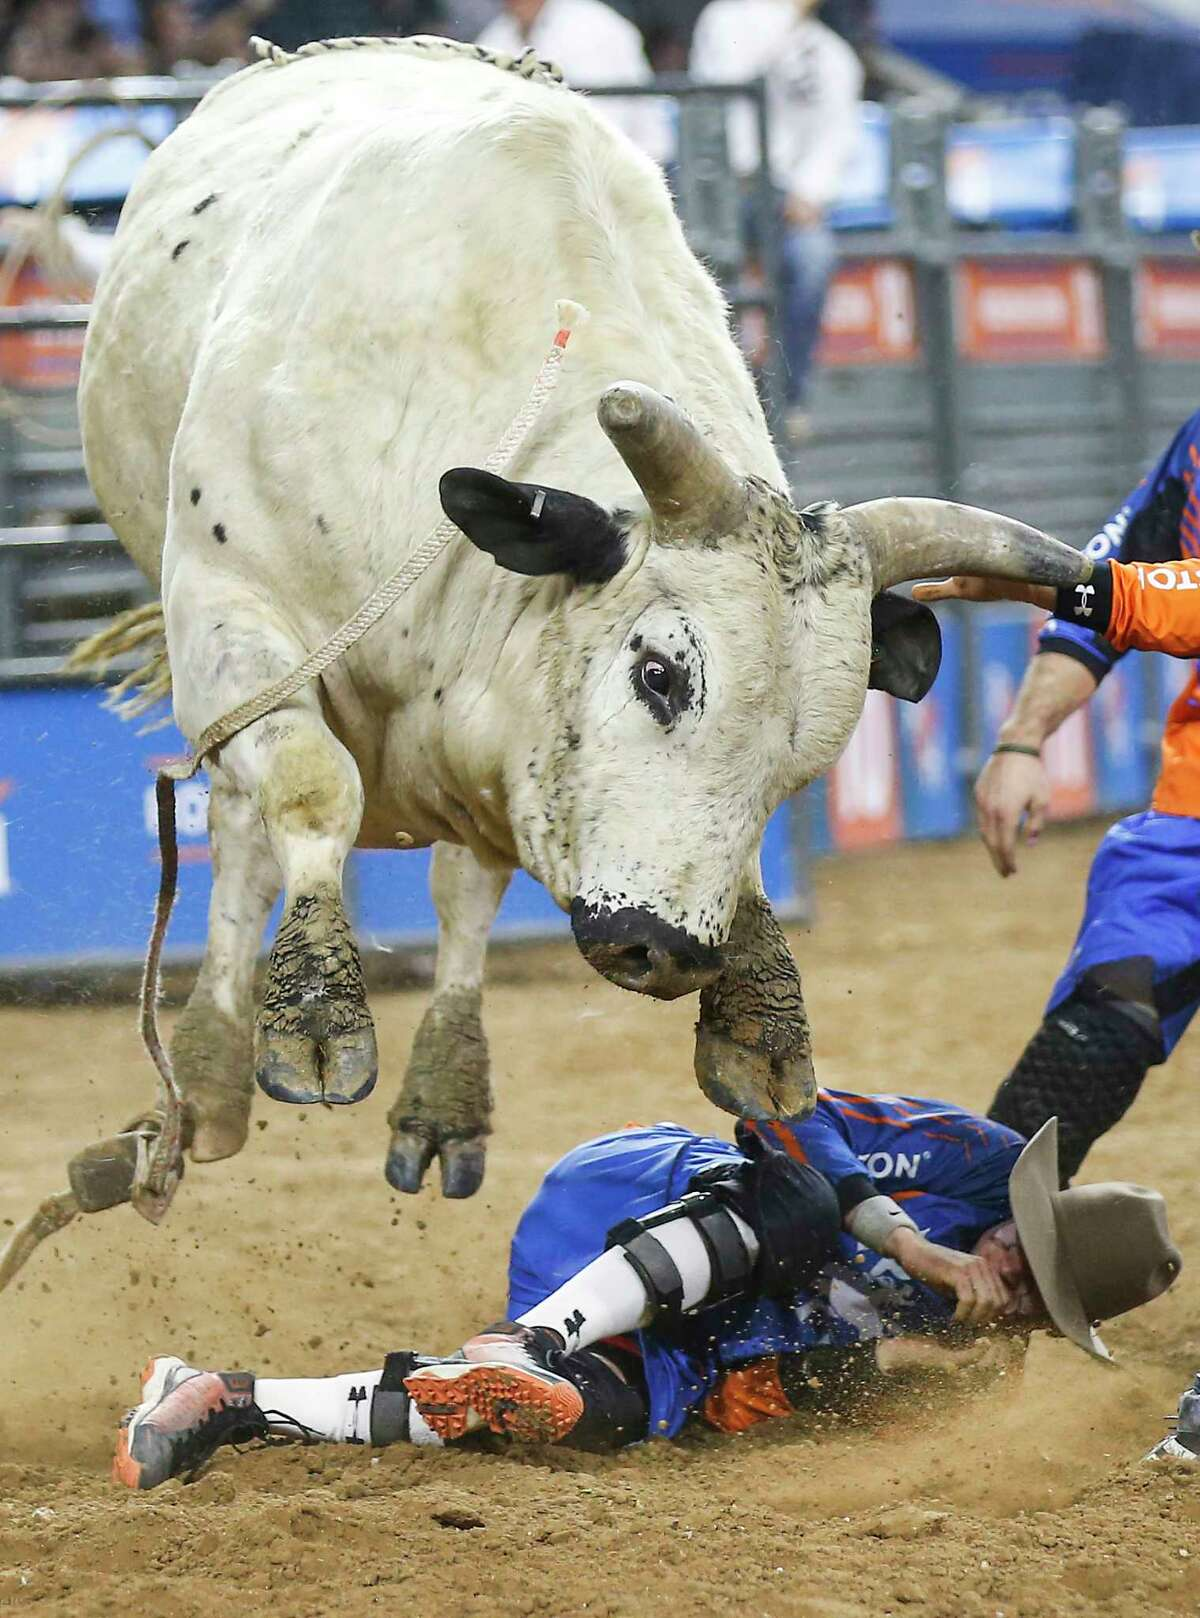 Hambone leaps over bullfighter Cody Webster after Trevor Kastner's ride during RodeoHouston Semifinal 2 at NRG Stadium on Thursday, March 14, 2019, in Houston.